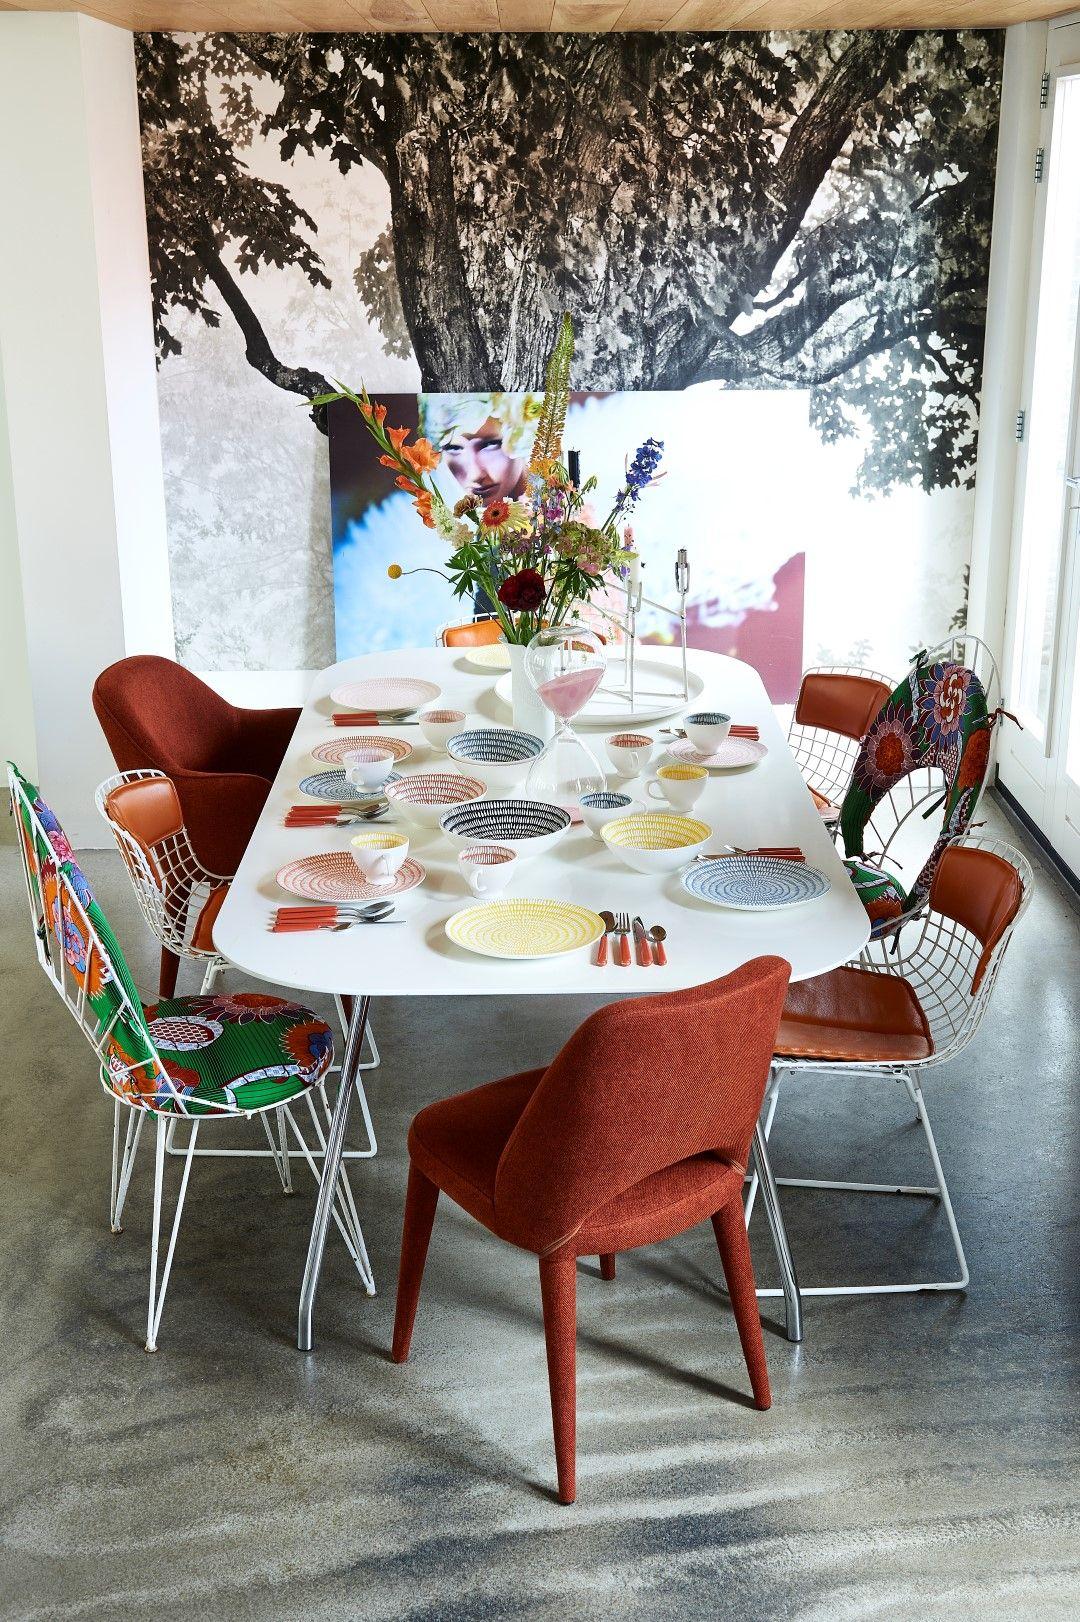 Buy pols potten holy fabric chair rust amara in 2020